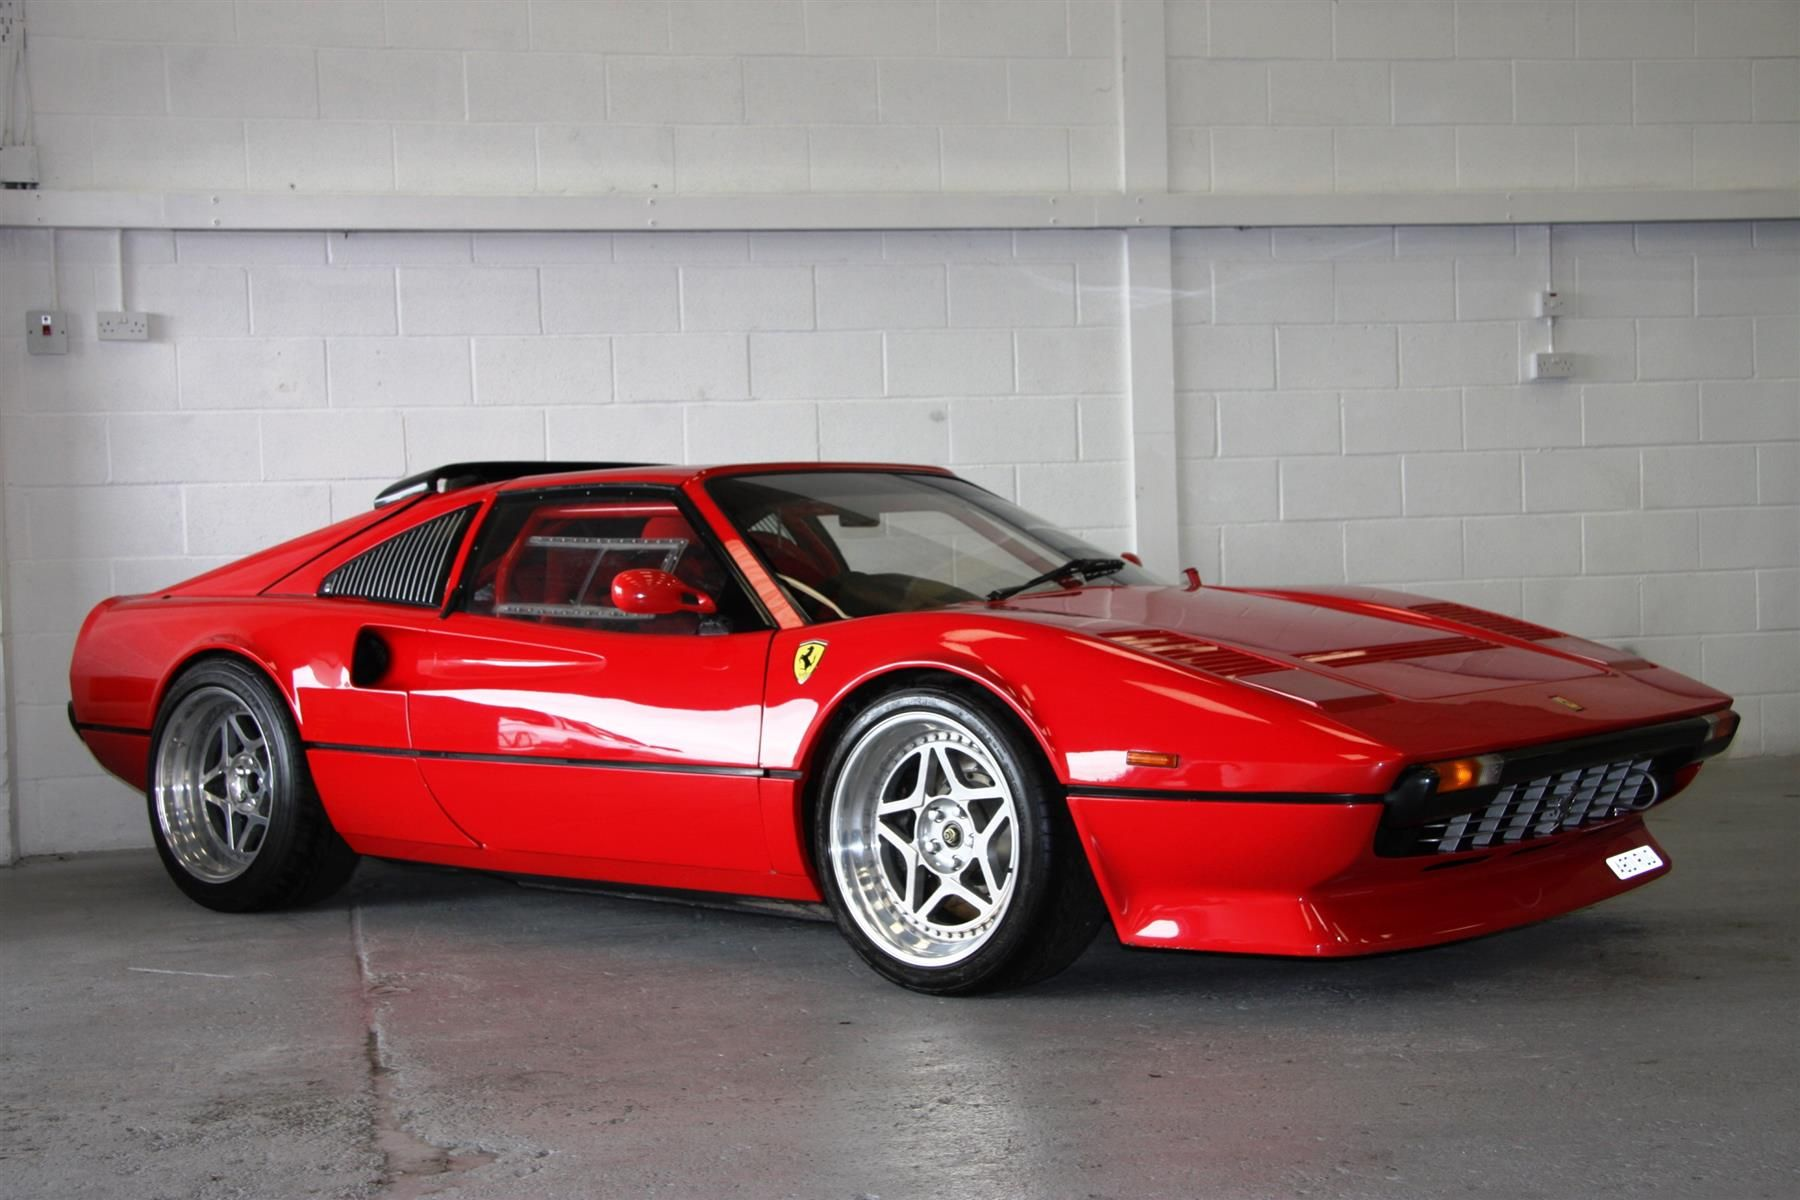 1984 Ferrari 308 Maintenance/restoration of old/vintage vehicles ...